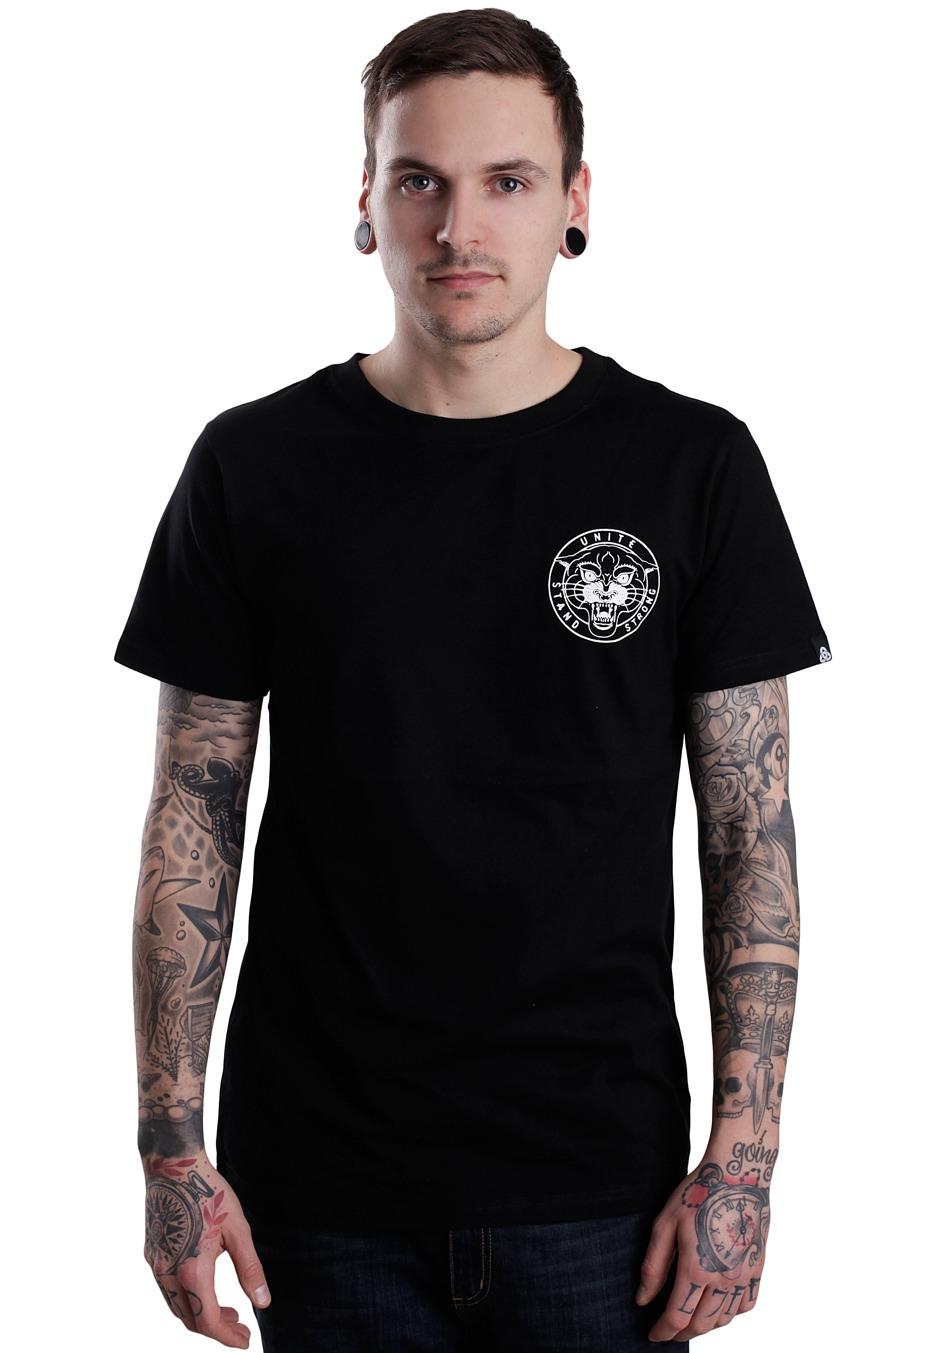 Unite clothing heavy duty t shirt streetwear shop for Heavy duty work t shirts